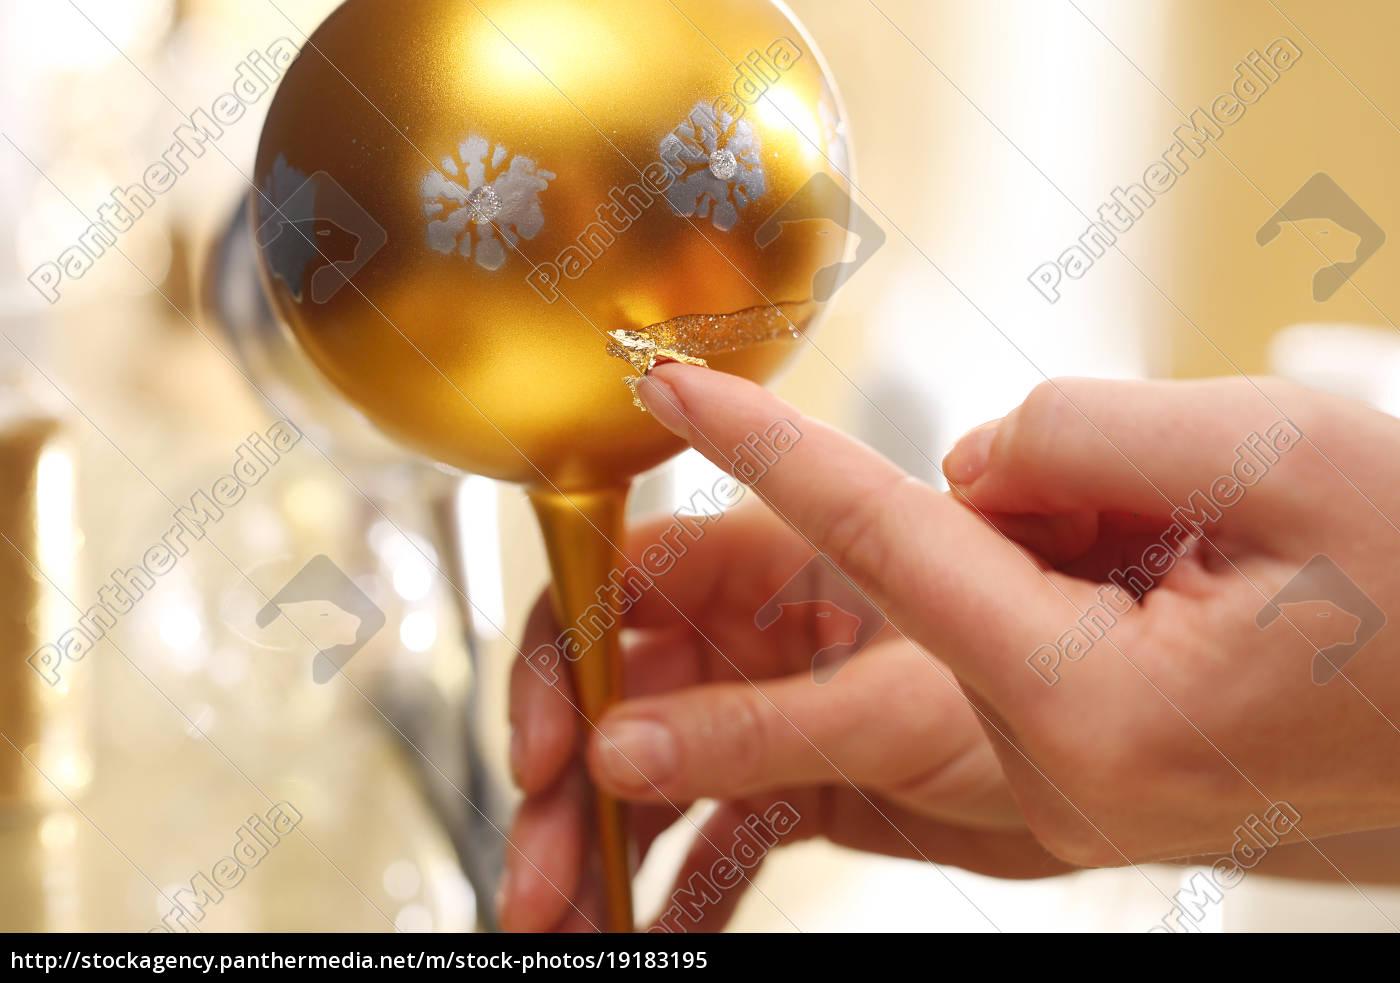 handwritten, prepare, christmas, decorations - 19183195